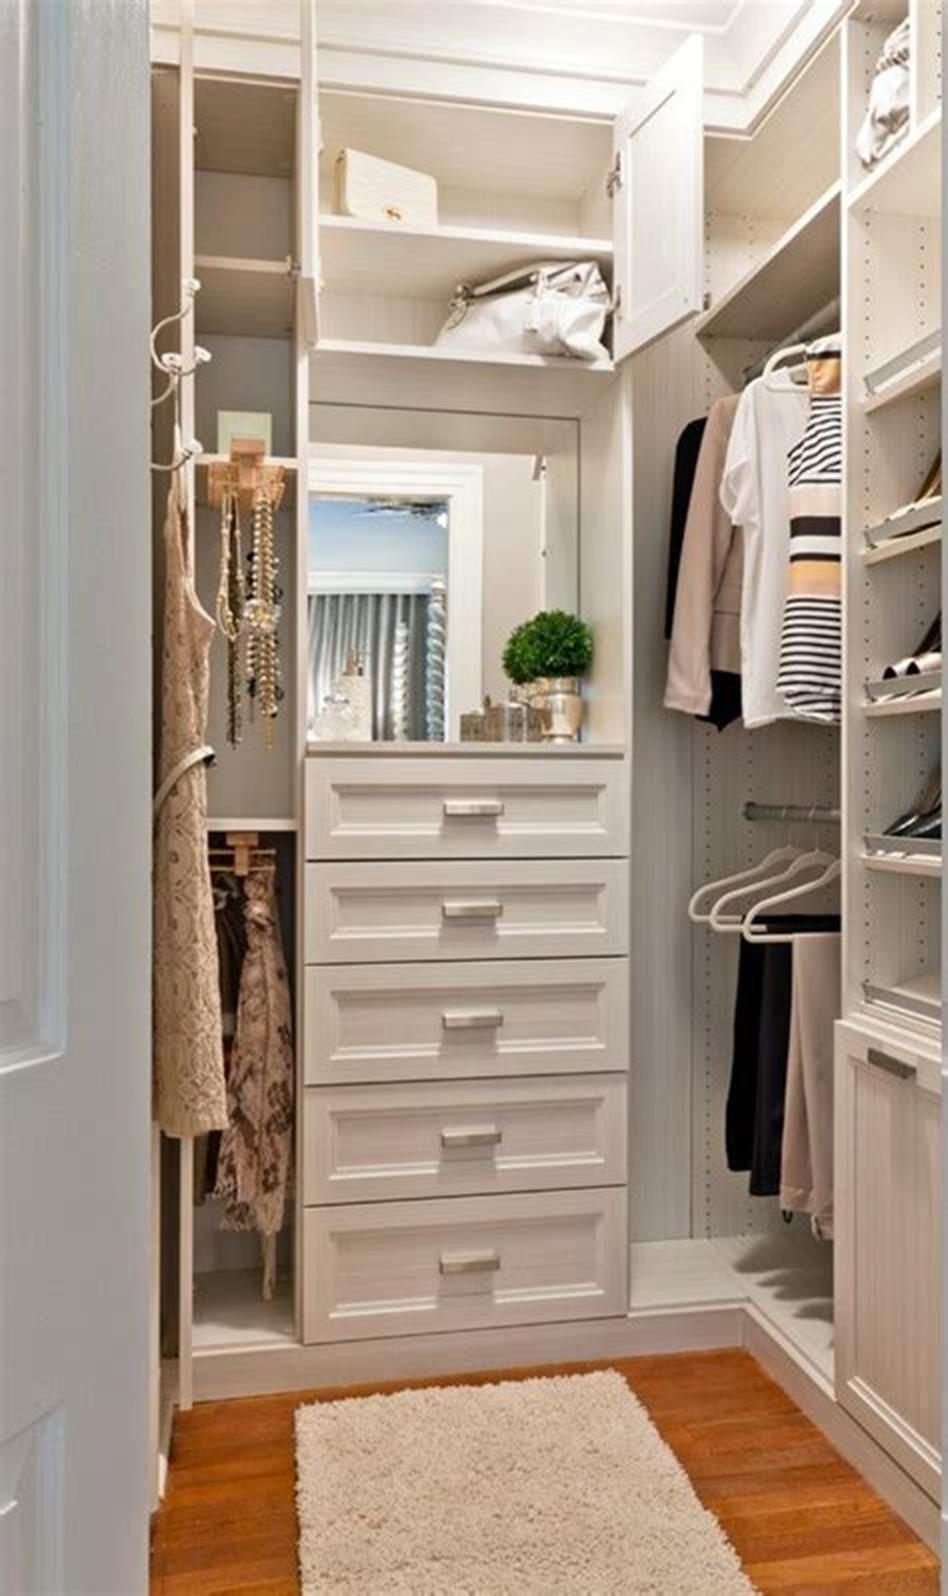 21 Best Small Walk In Bedroom Closet Organization and Design Ideas